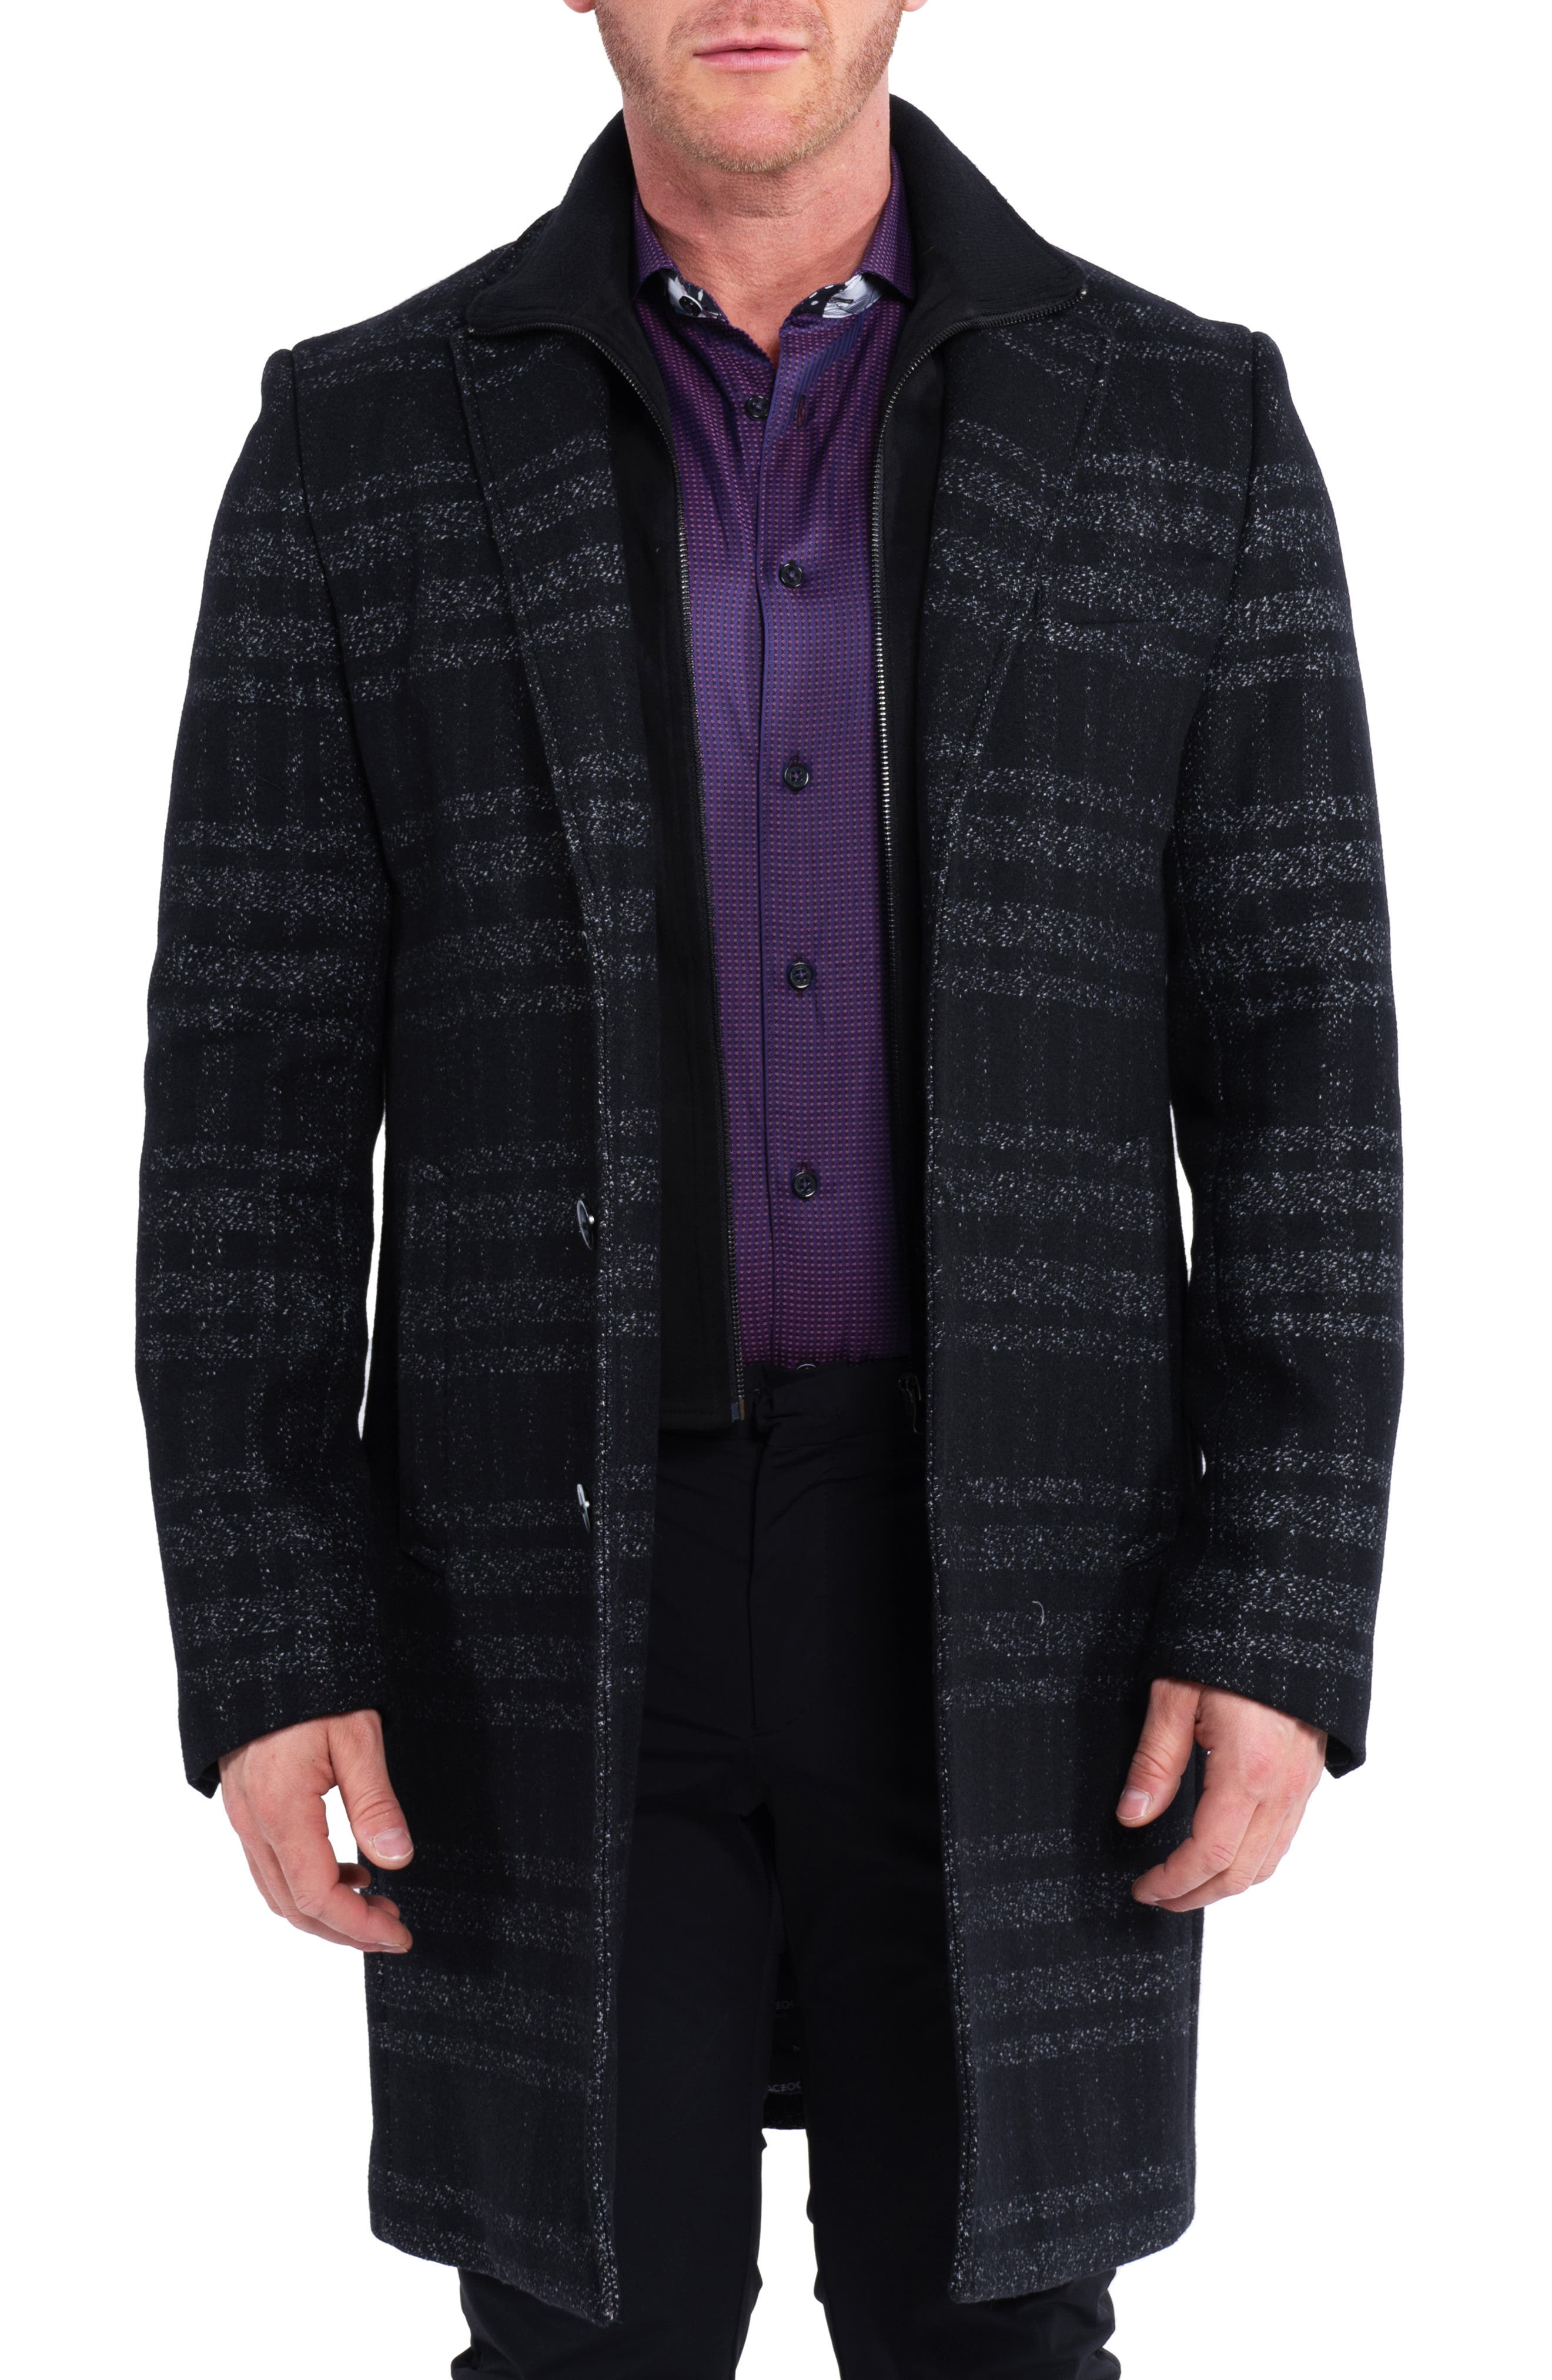 Captainplaid Wool Overcoat